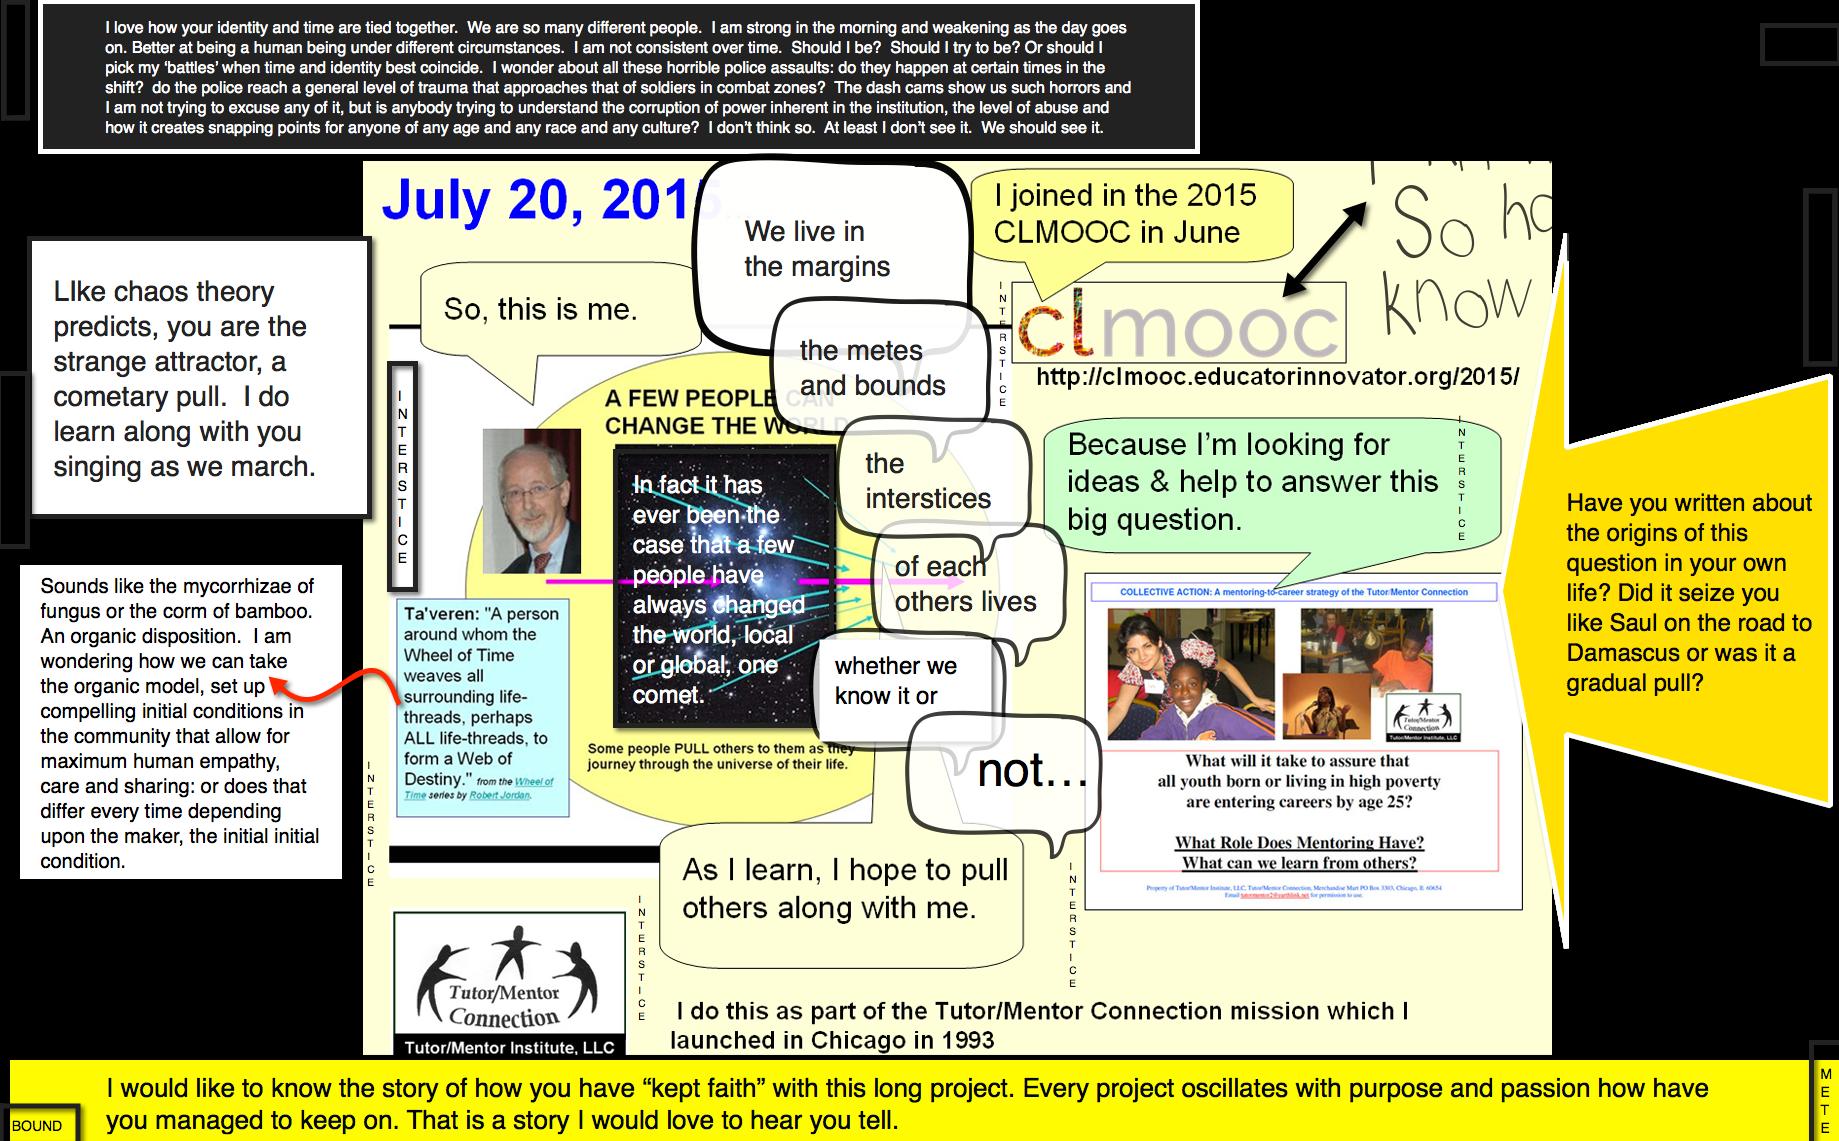 2015-07-22_10-48-00